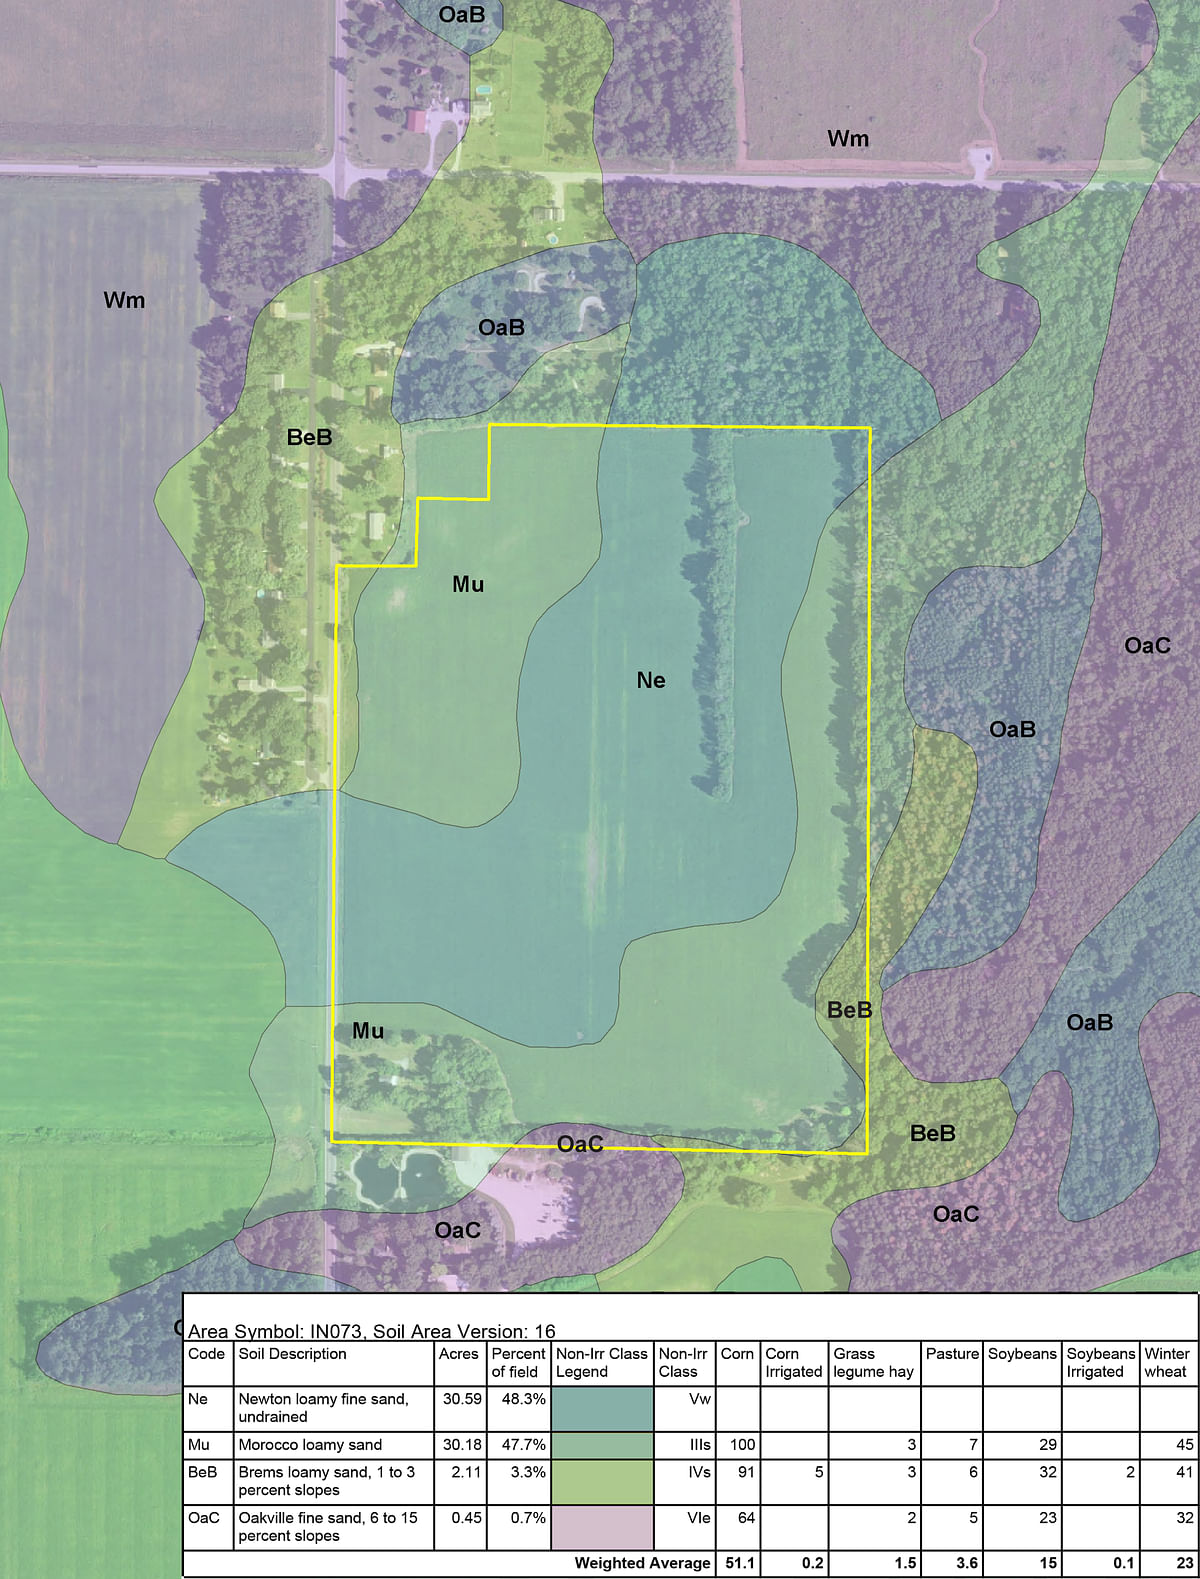 Indiana jasper county tefft - Soil Information